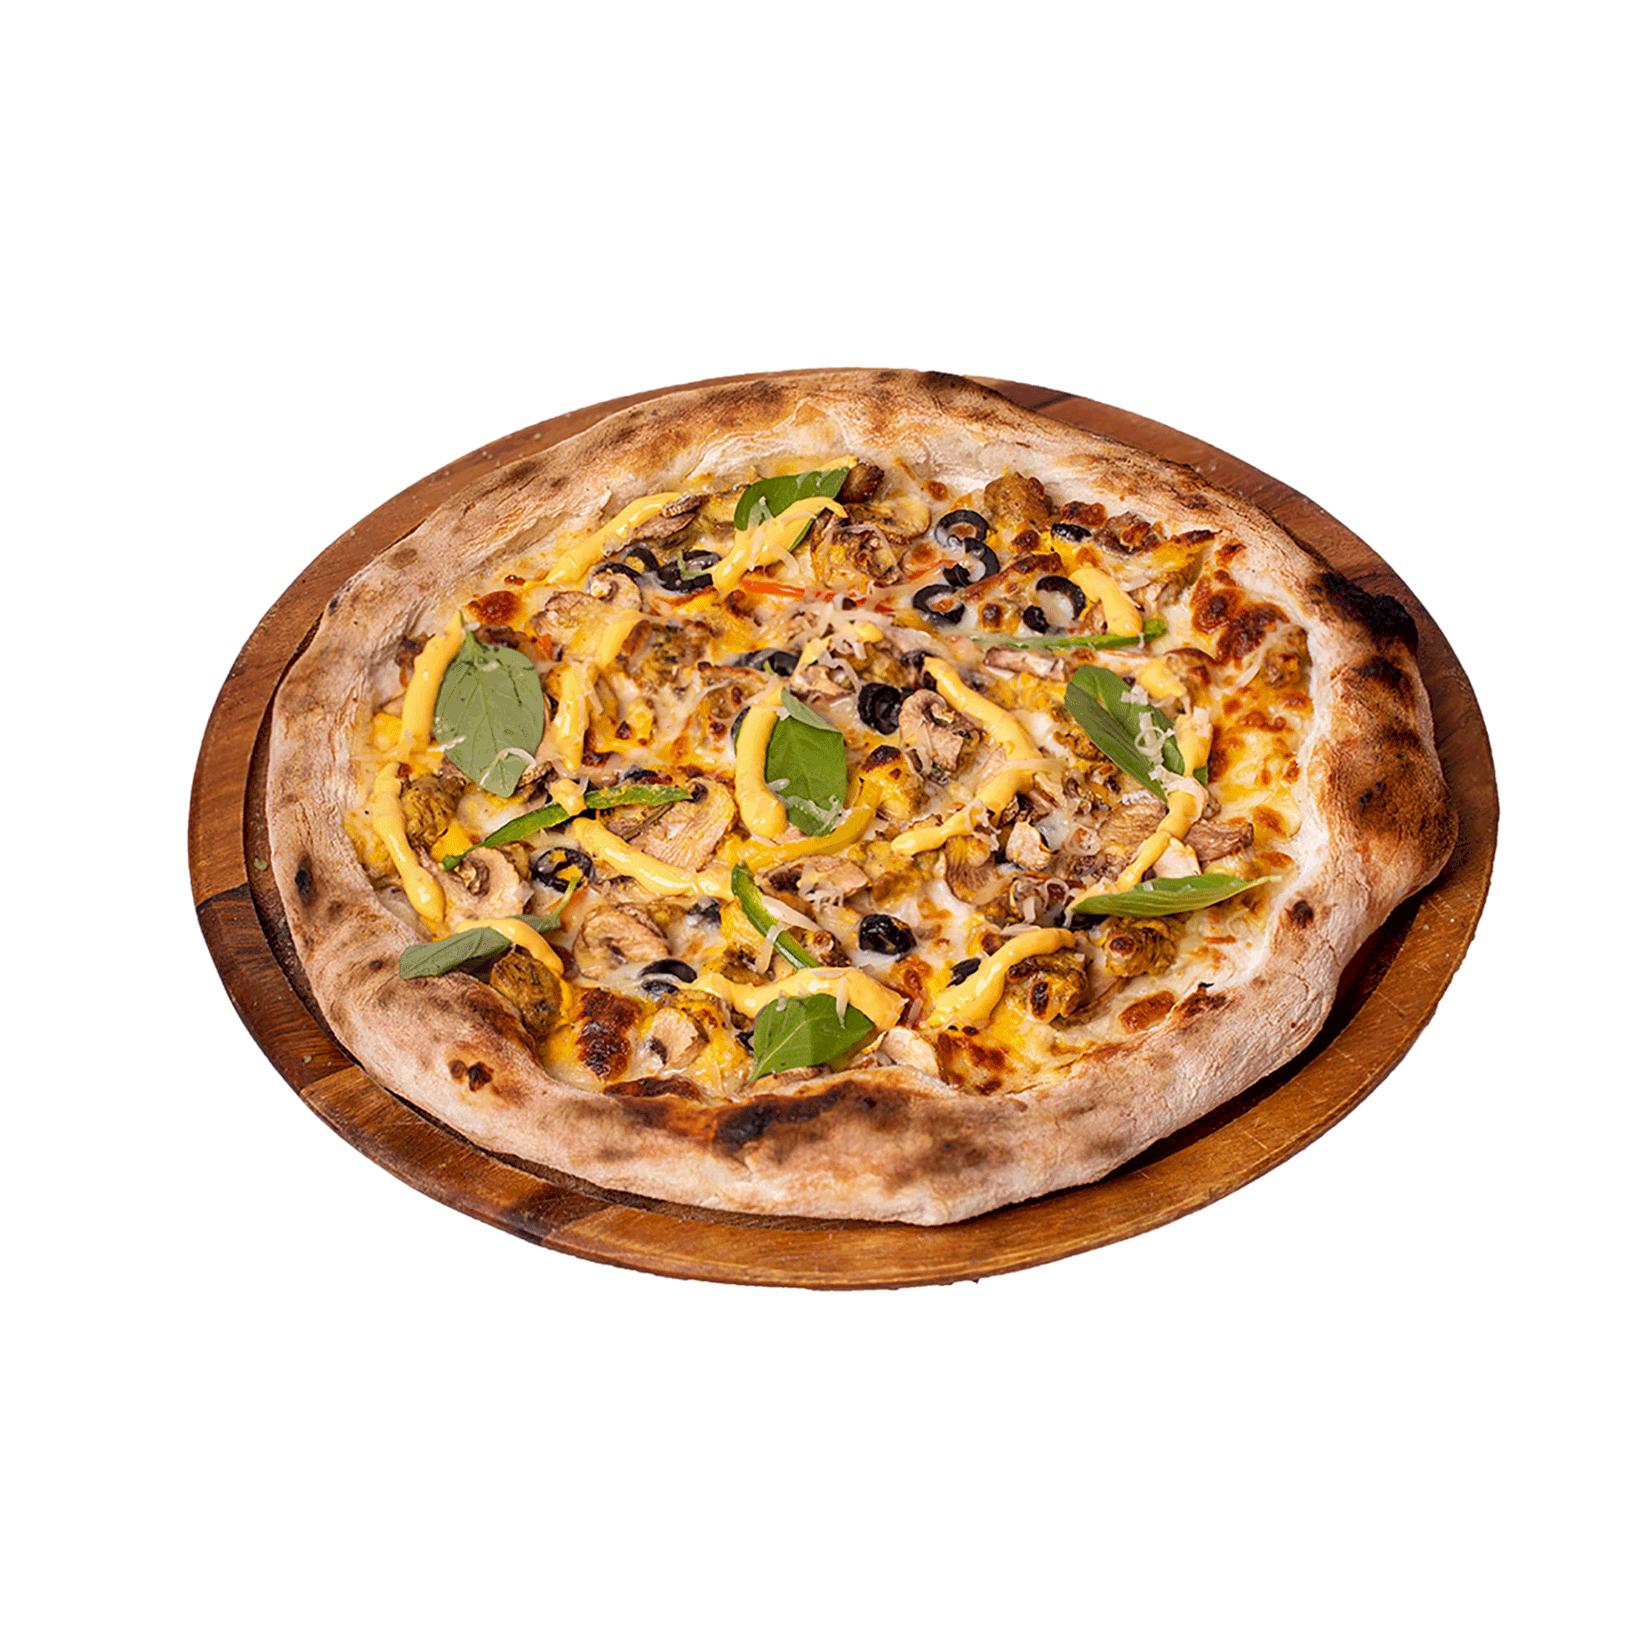 پيتزا ناپولي (مرغ  و  قارچ)